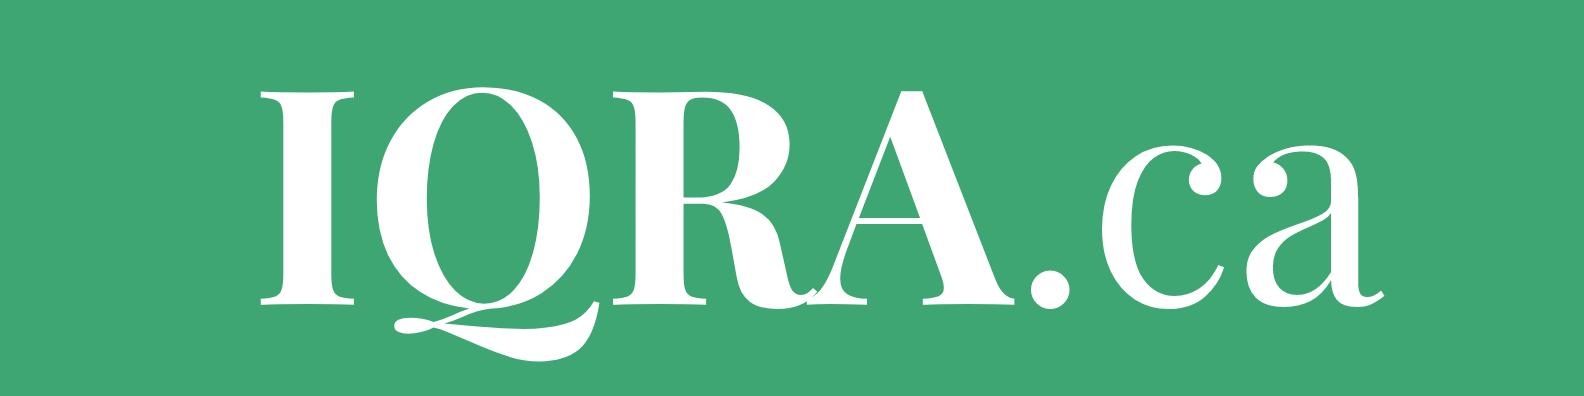 Iqra.ca